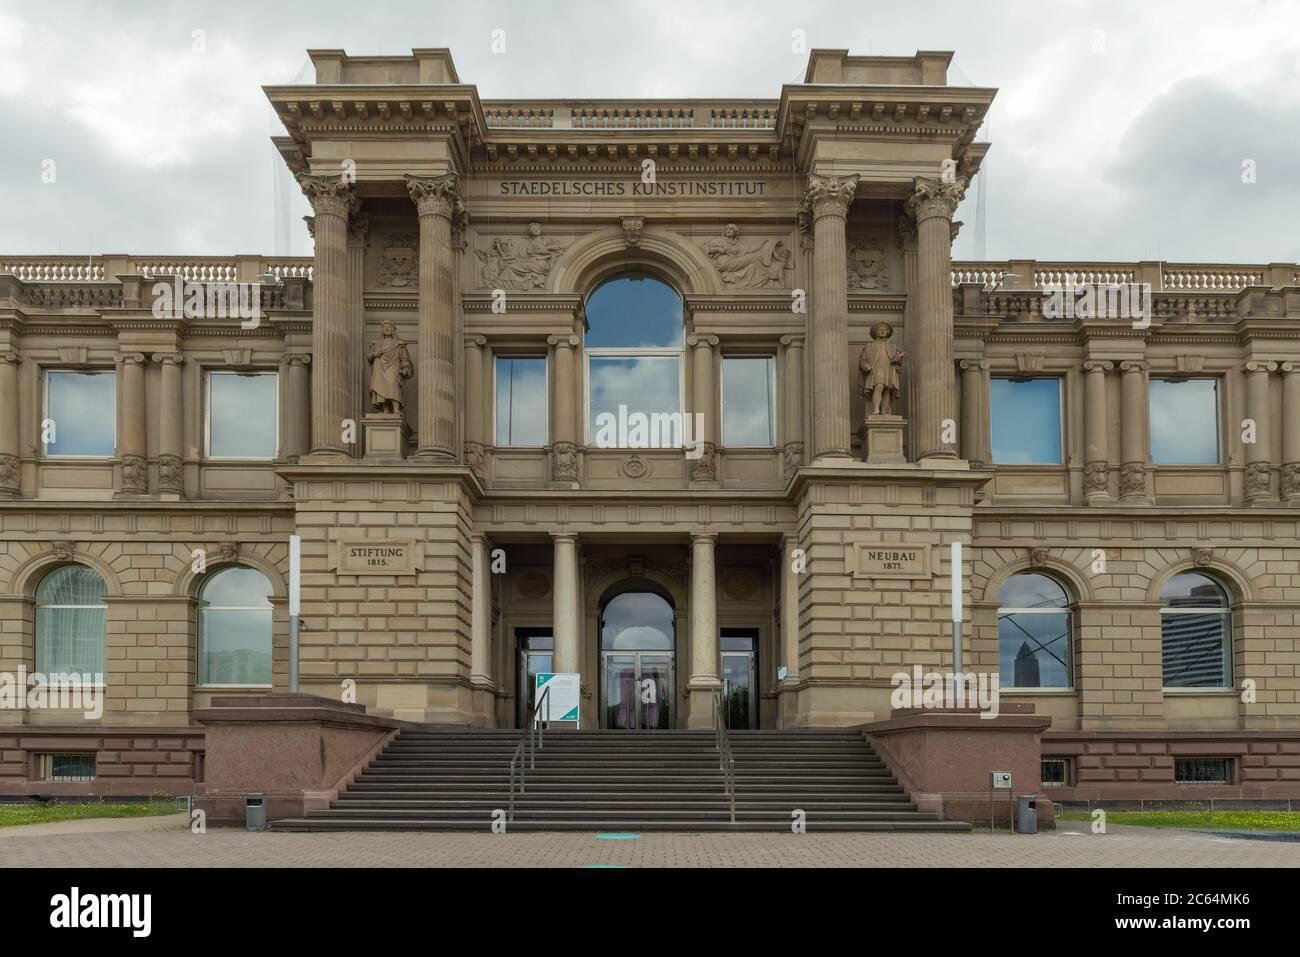 entrance Staedel Museum, art museum in Frankfurt am Main, Germany Stock Photo